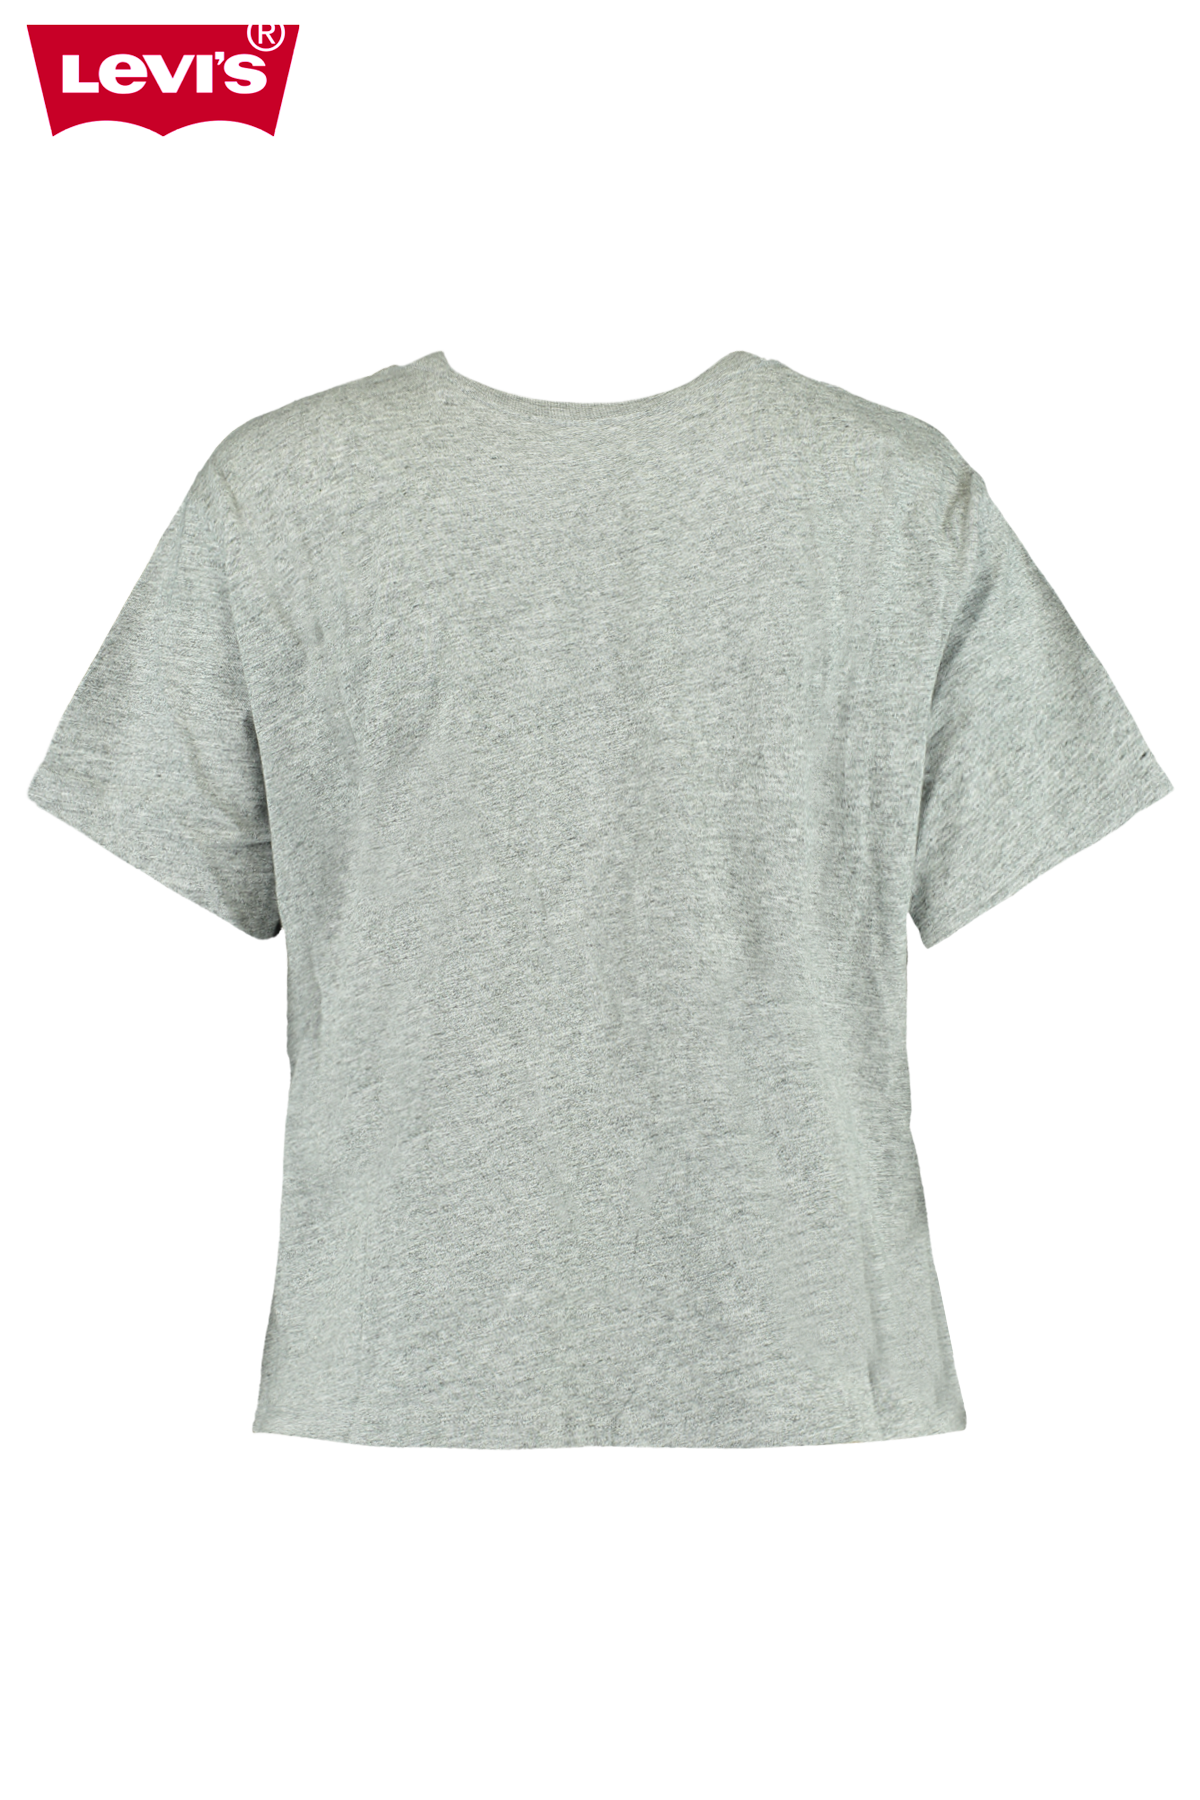 T-shirt Graphic varisty tee